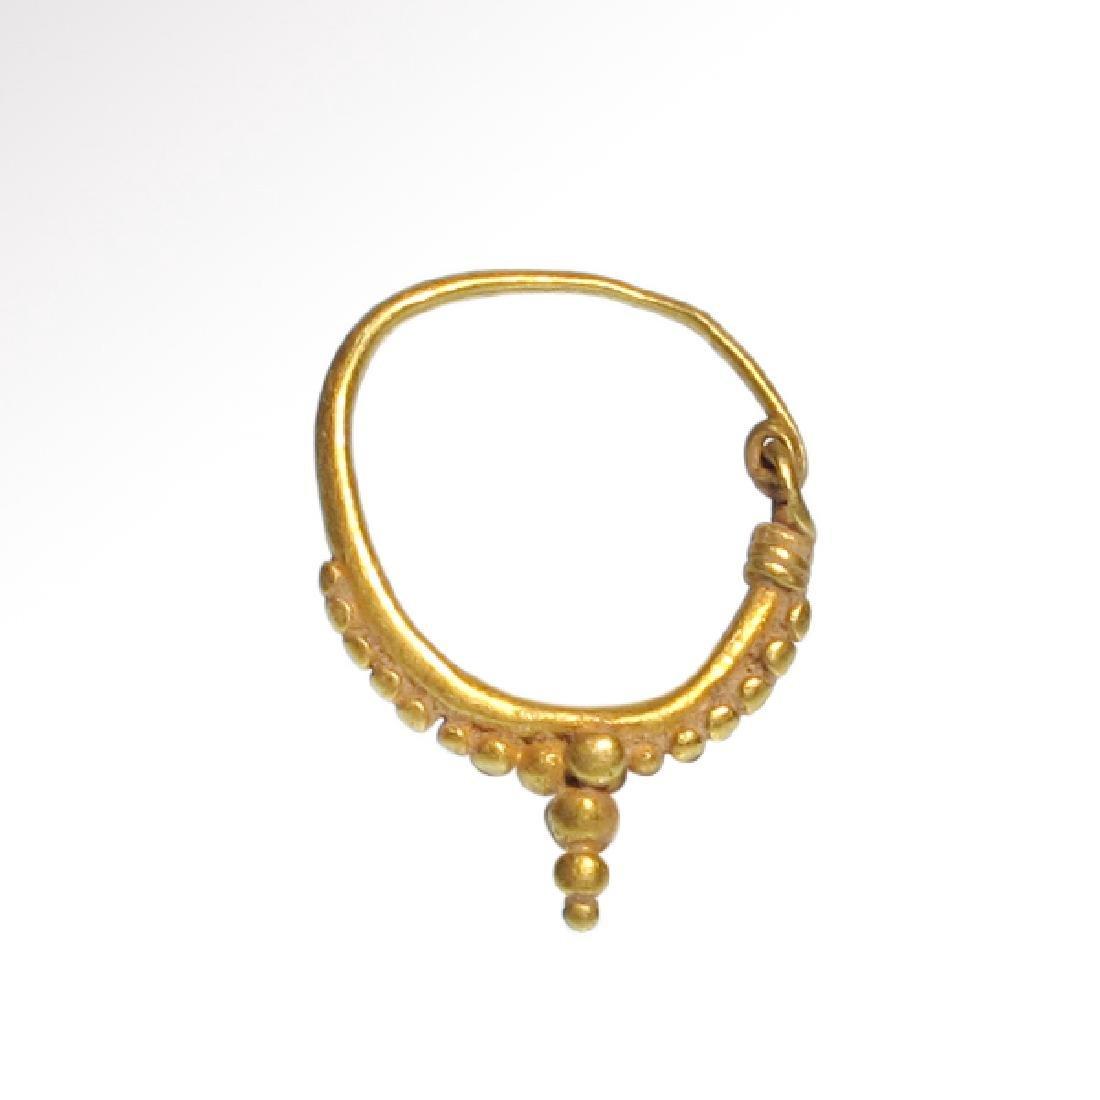 Roman Gold Hoop Earrings, c. 2nd-4th Century A.D. - 3